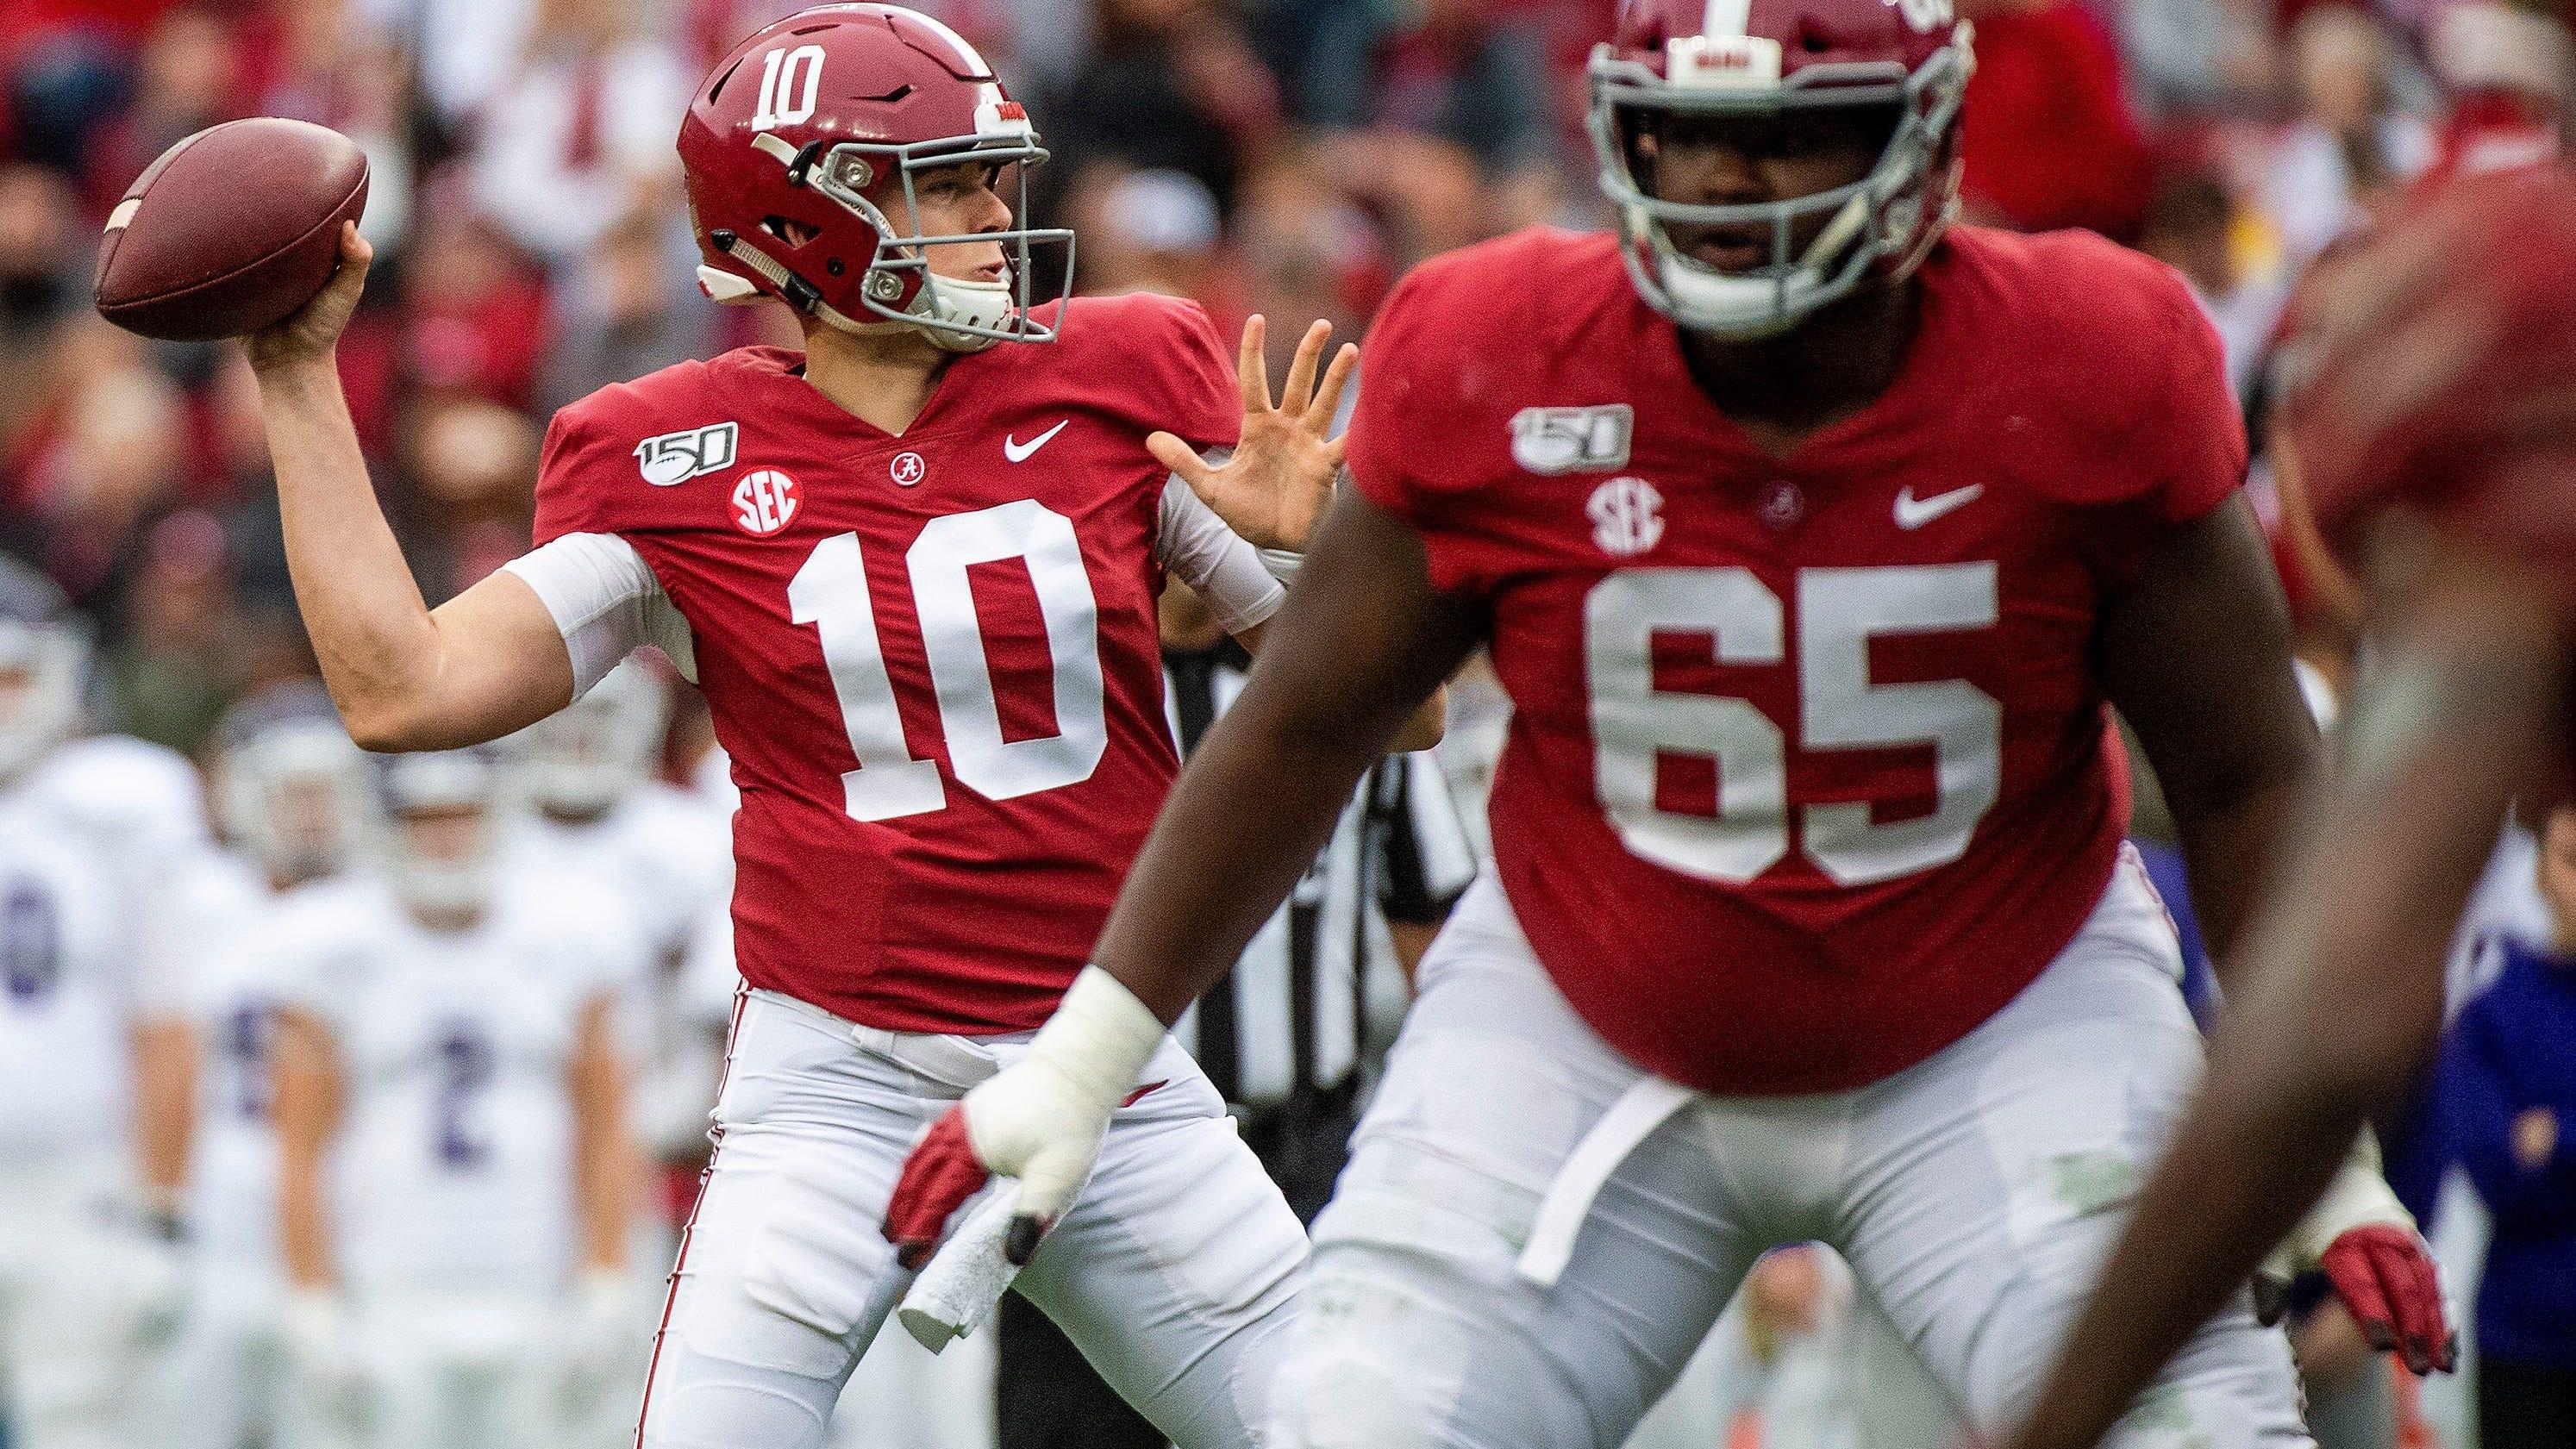 Start of SEC kickoff brings boost to college football season